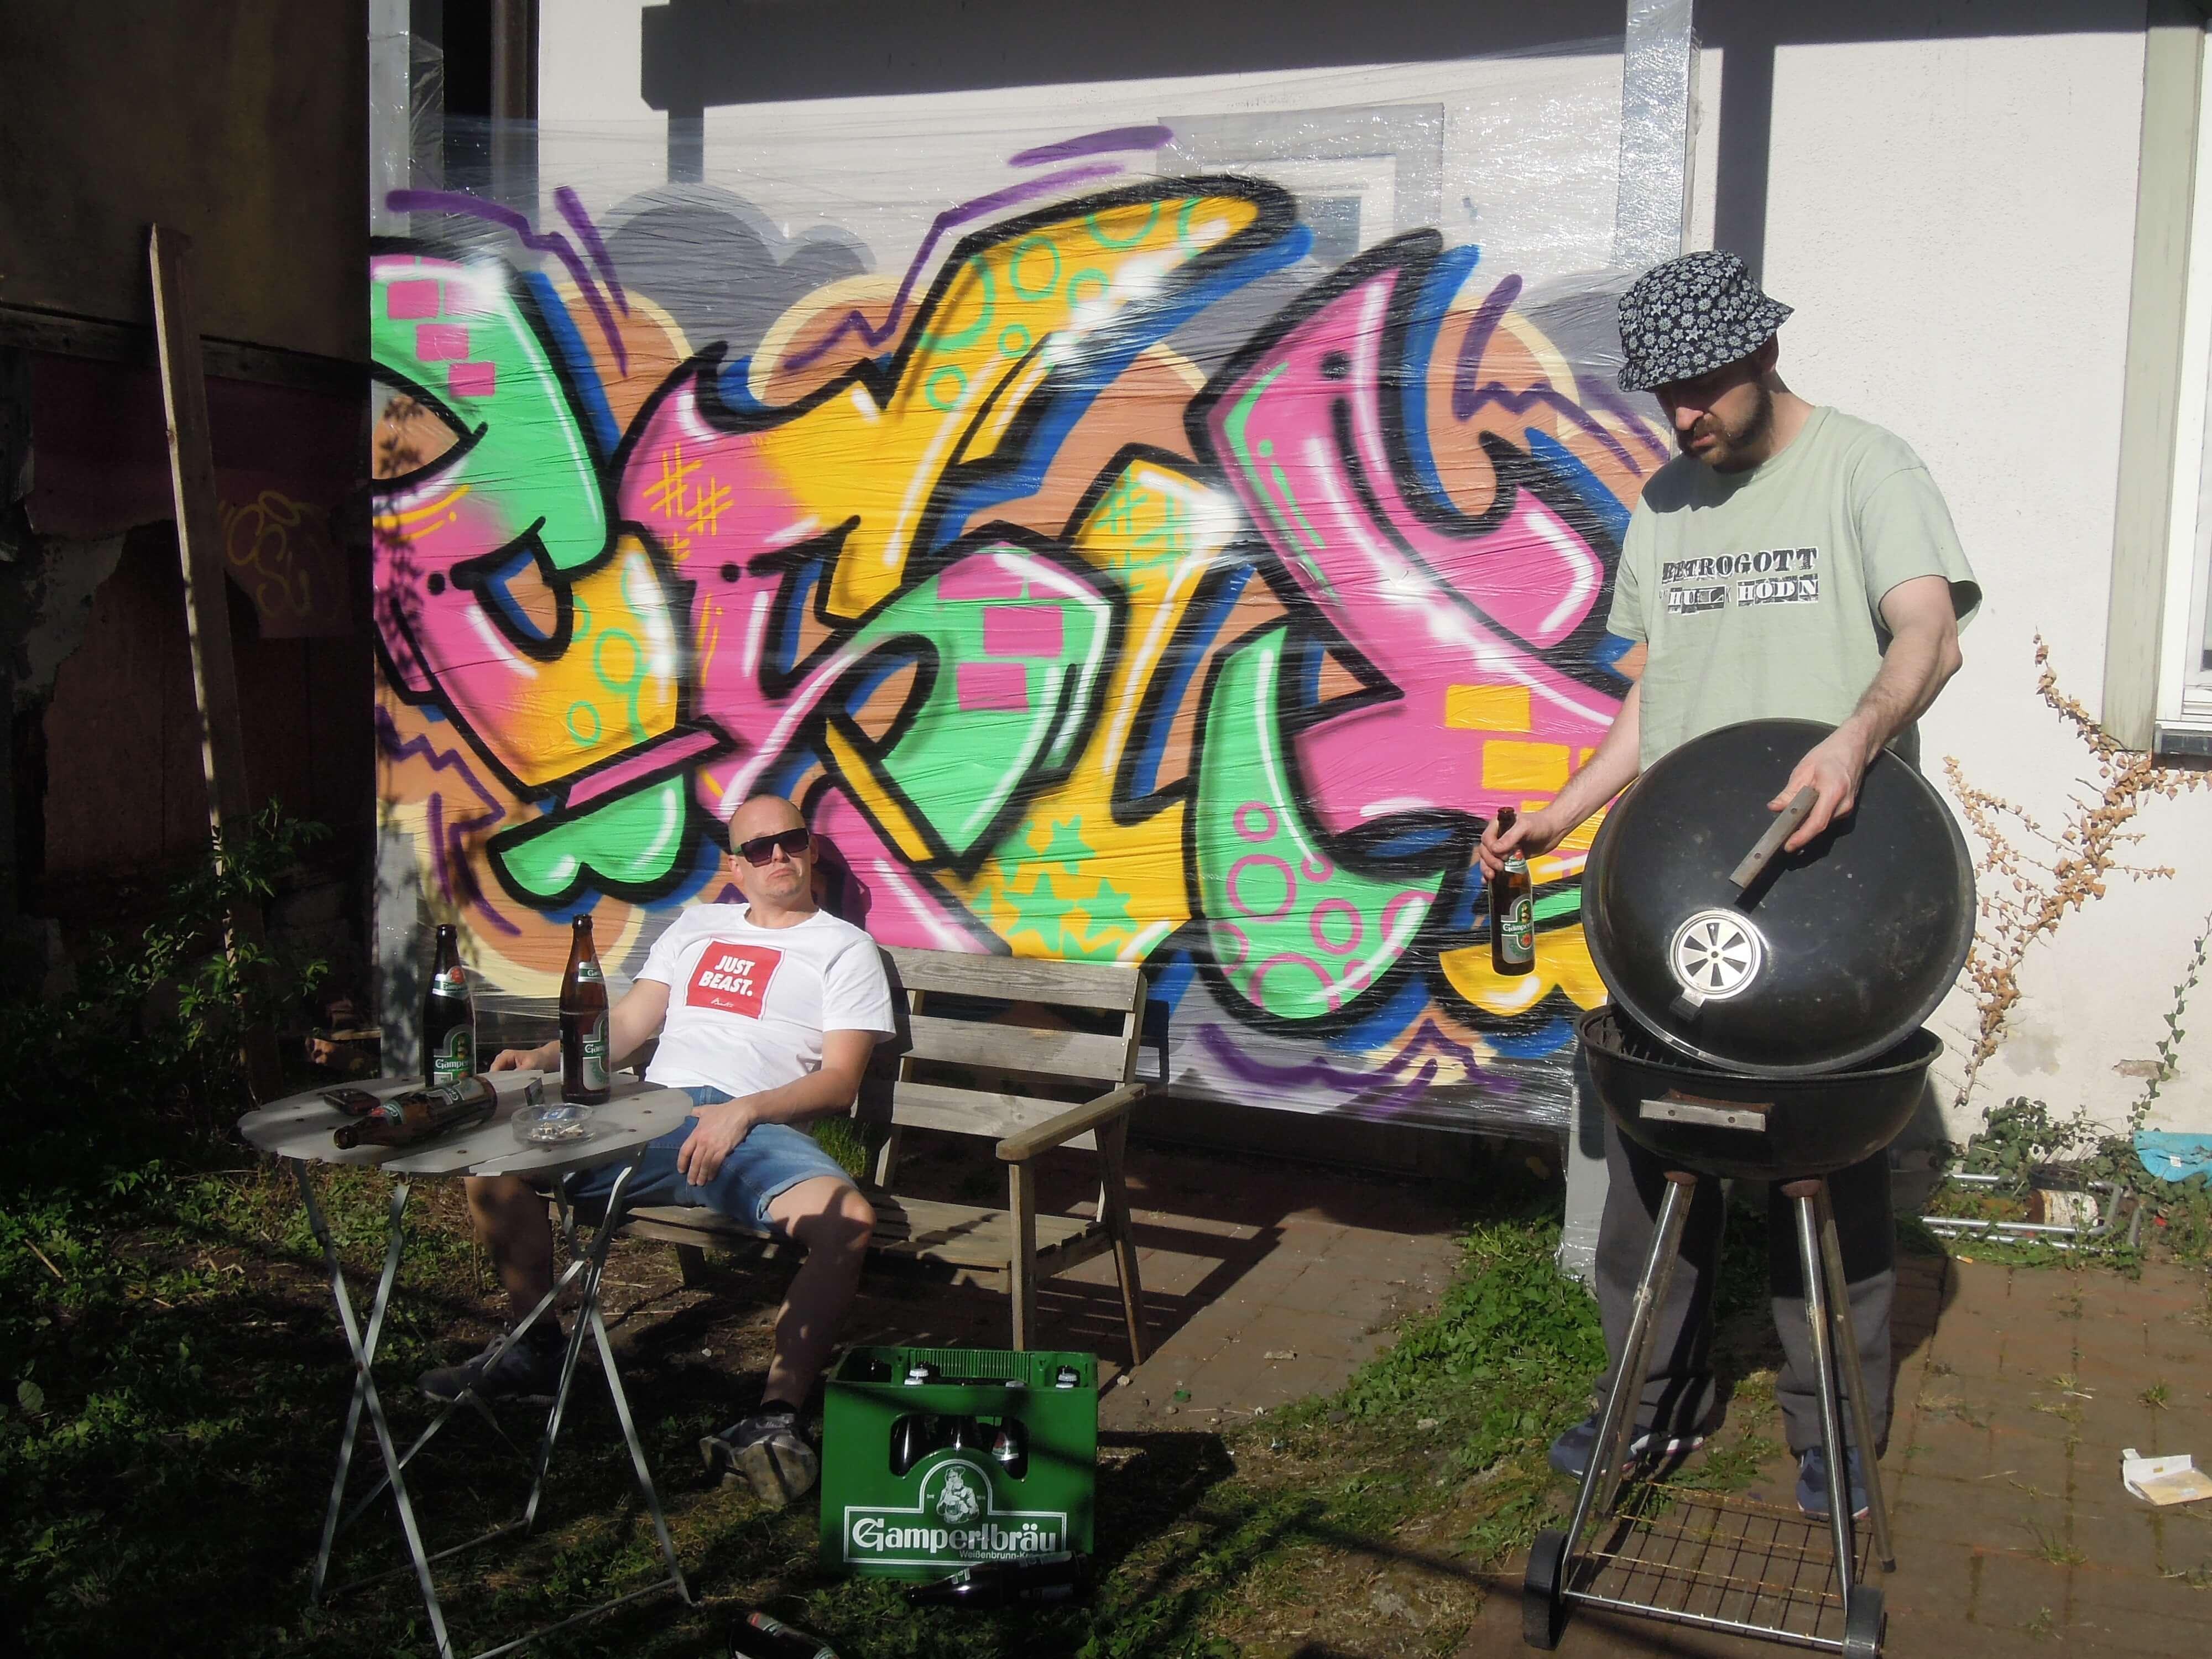 rezepte Covber shooting. Kunst und so - Grüß dich mei Guder. Street Art. Graffiti Coburg. JDE TDN CSW GDMG!